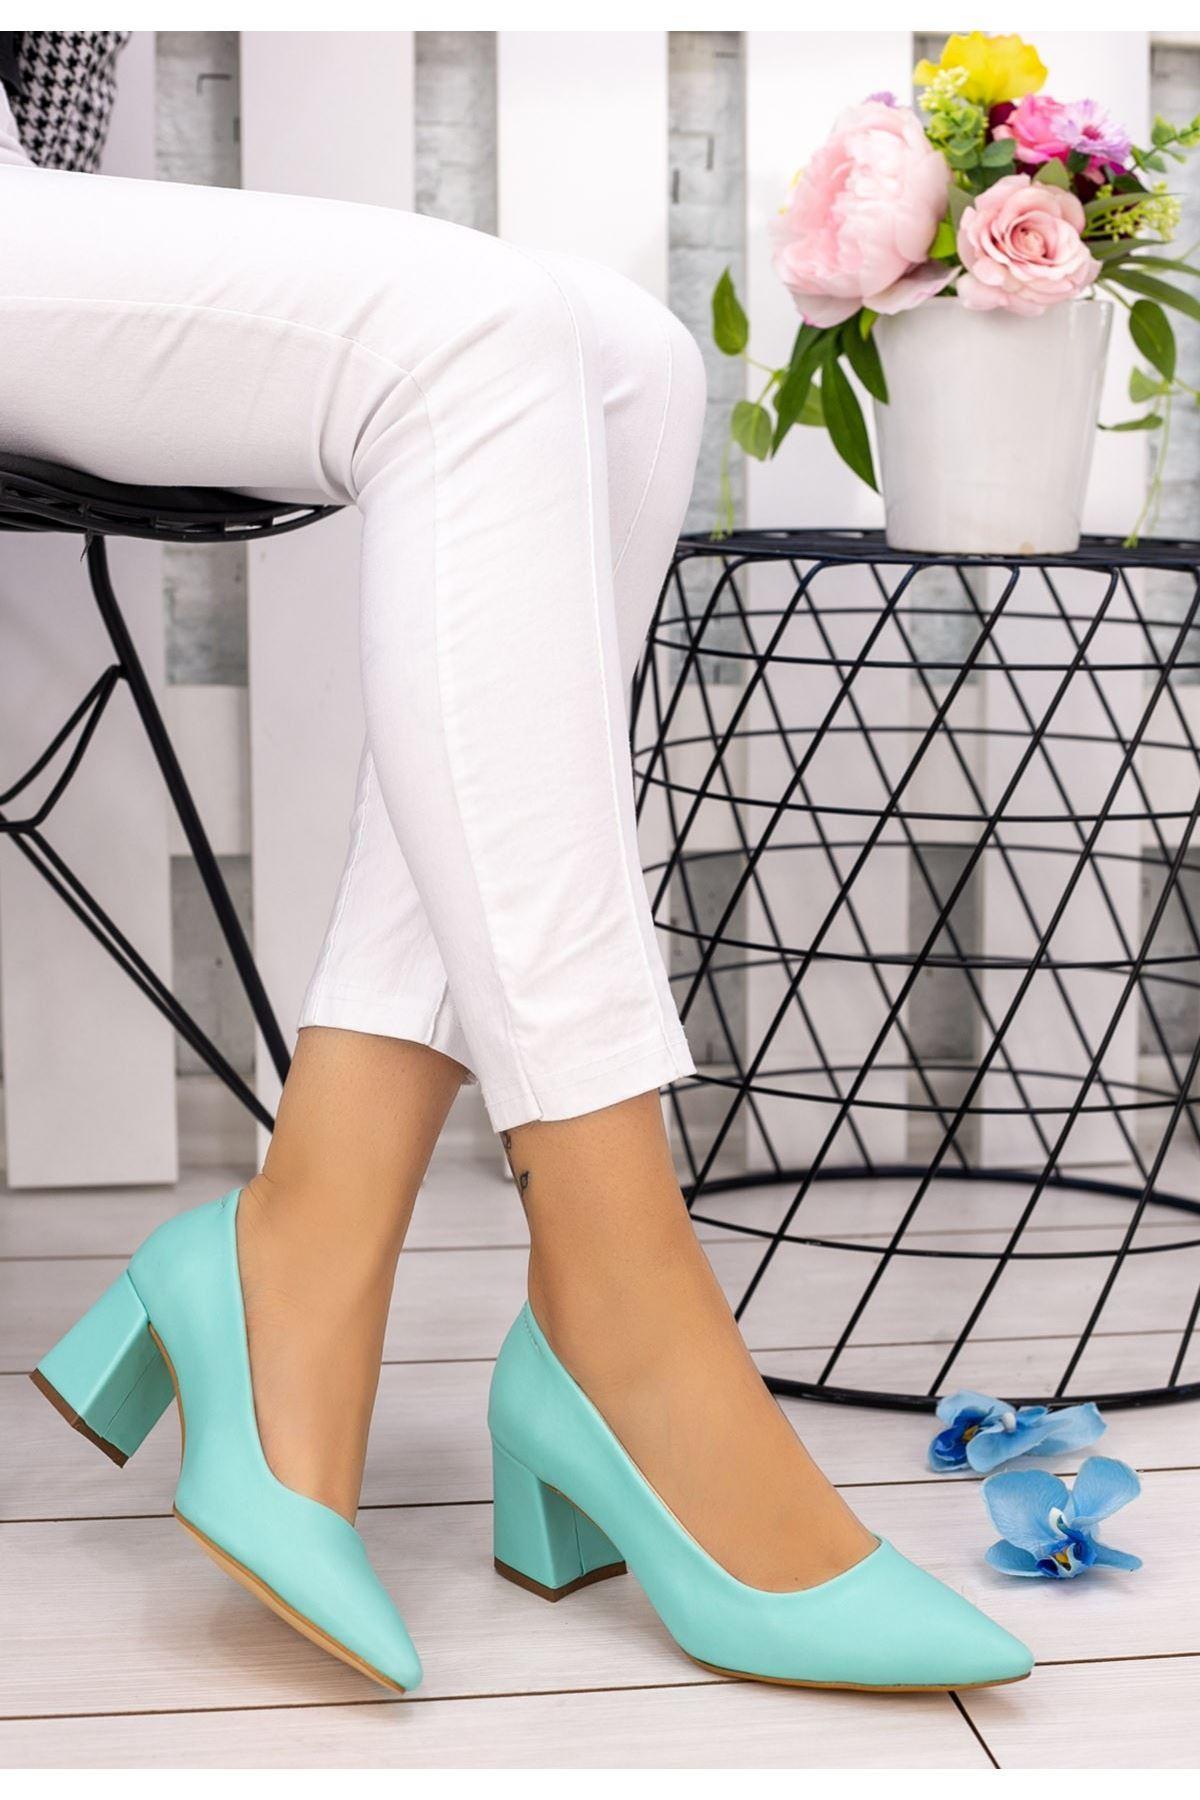 Manina Su Yeşili Cilt Topuklu Ayakkabı